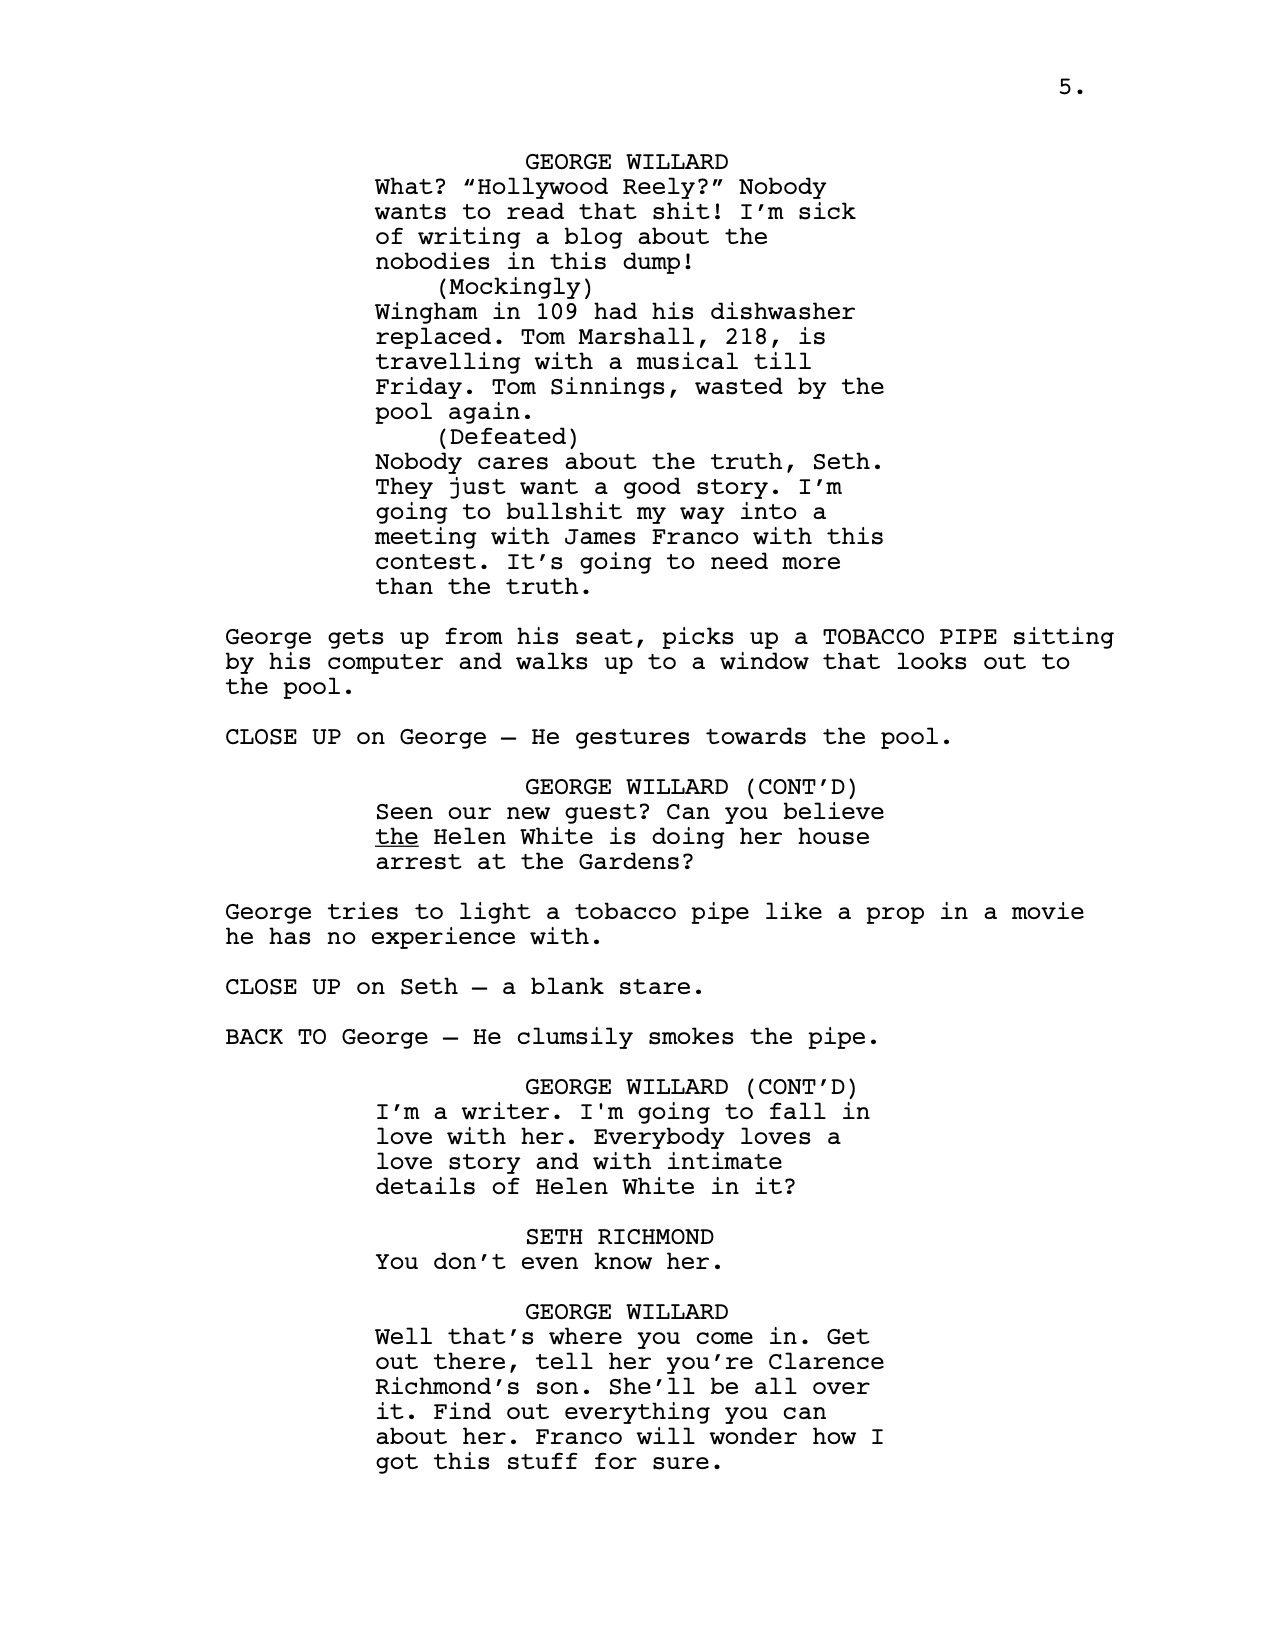 Page-5-DavidLook-TheGardens-1